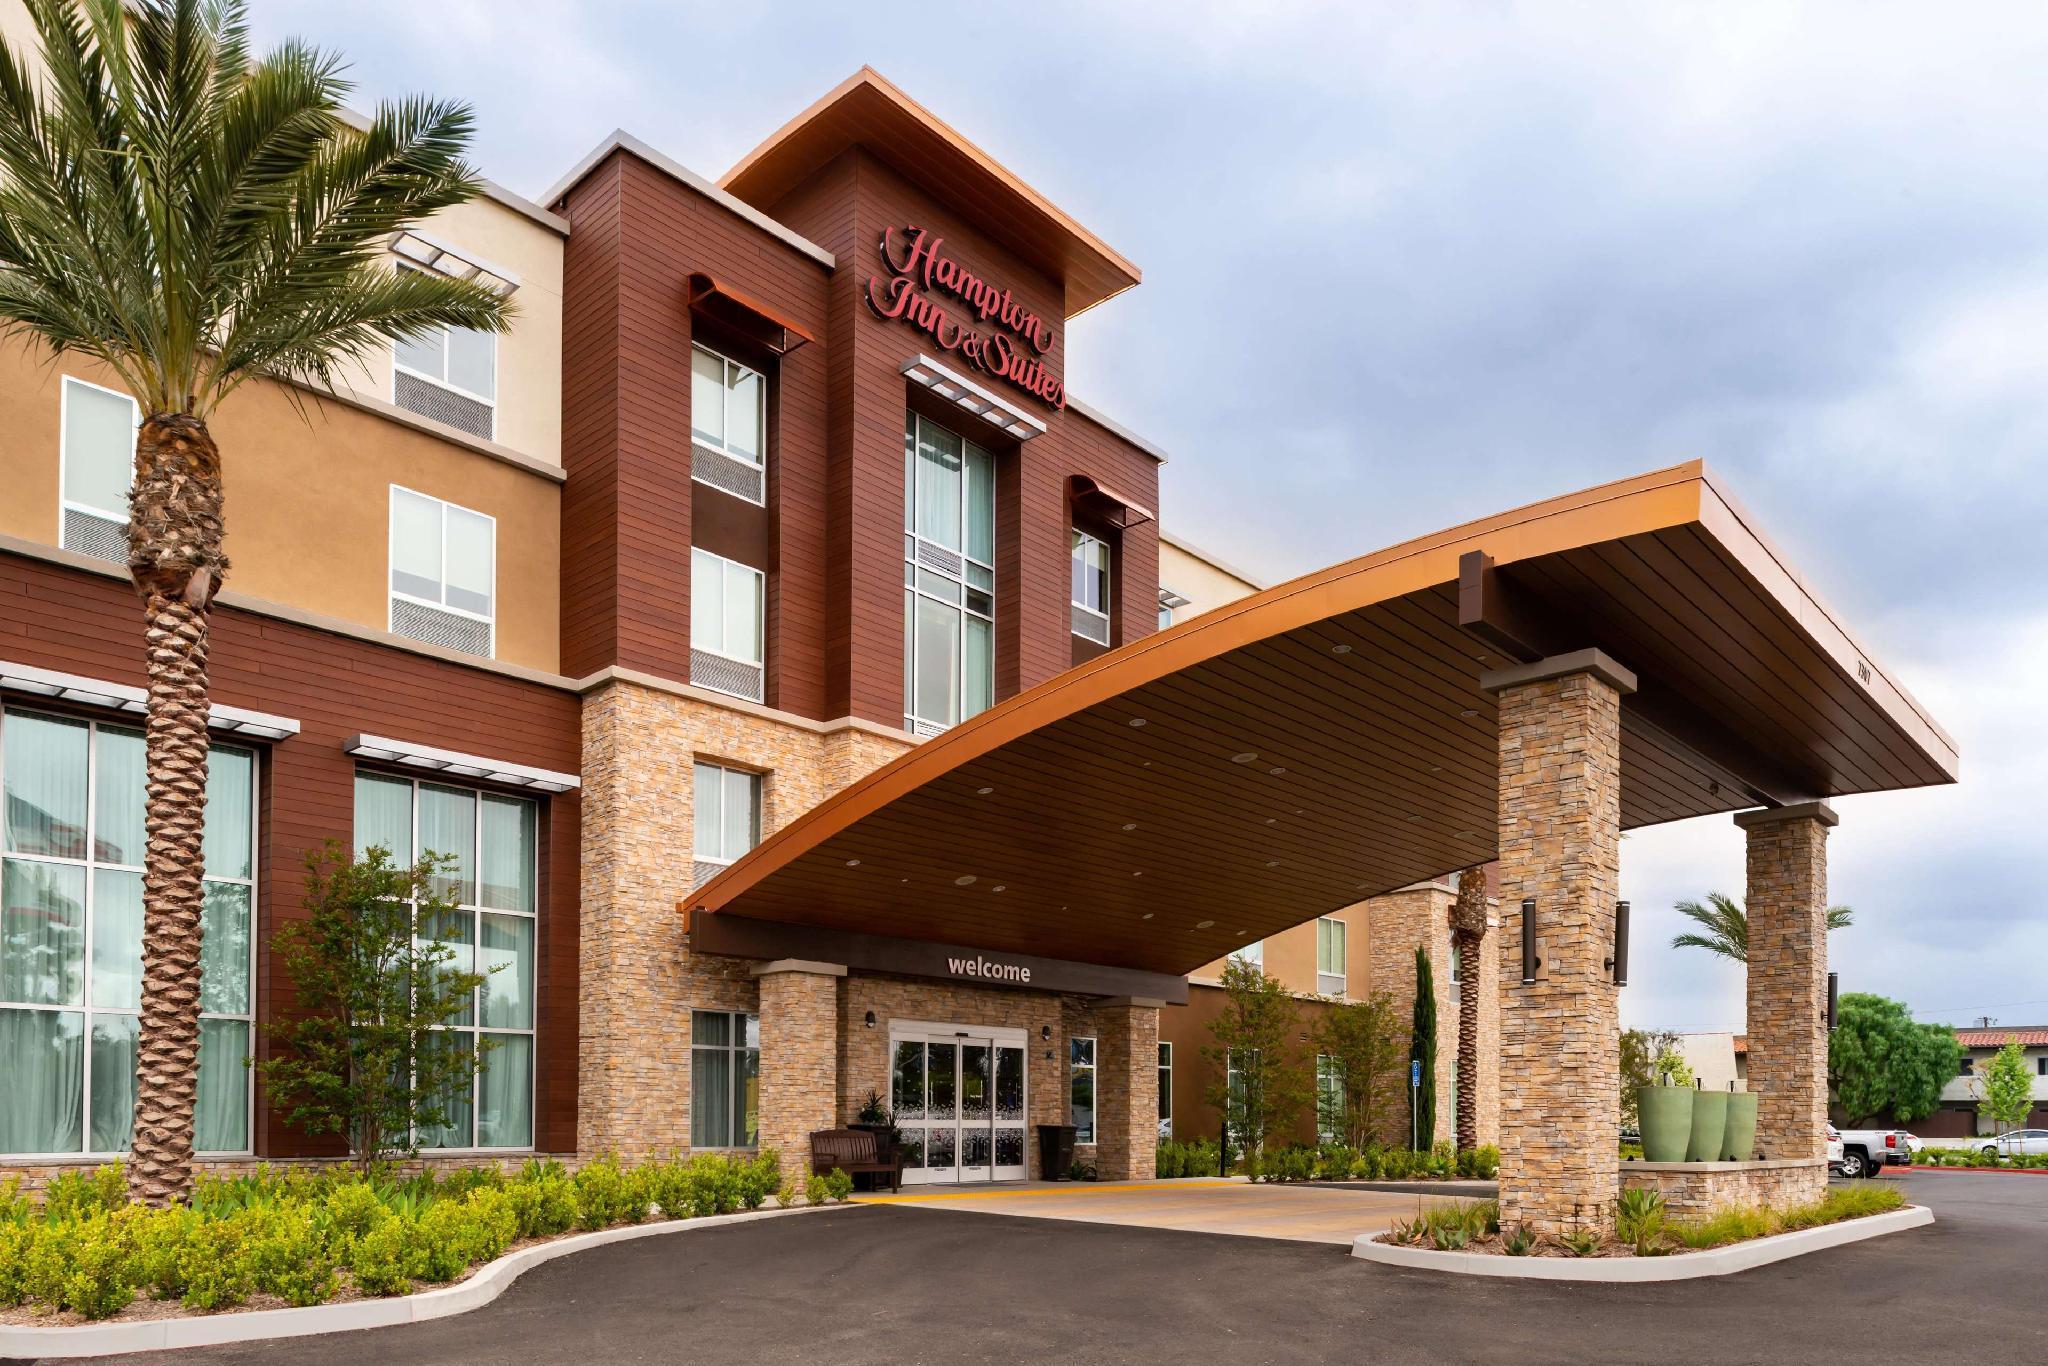 Hampton Inn And Suites Buena Park